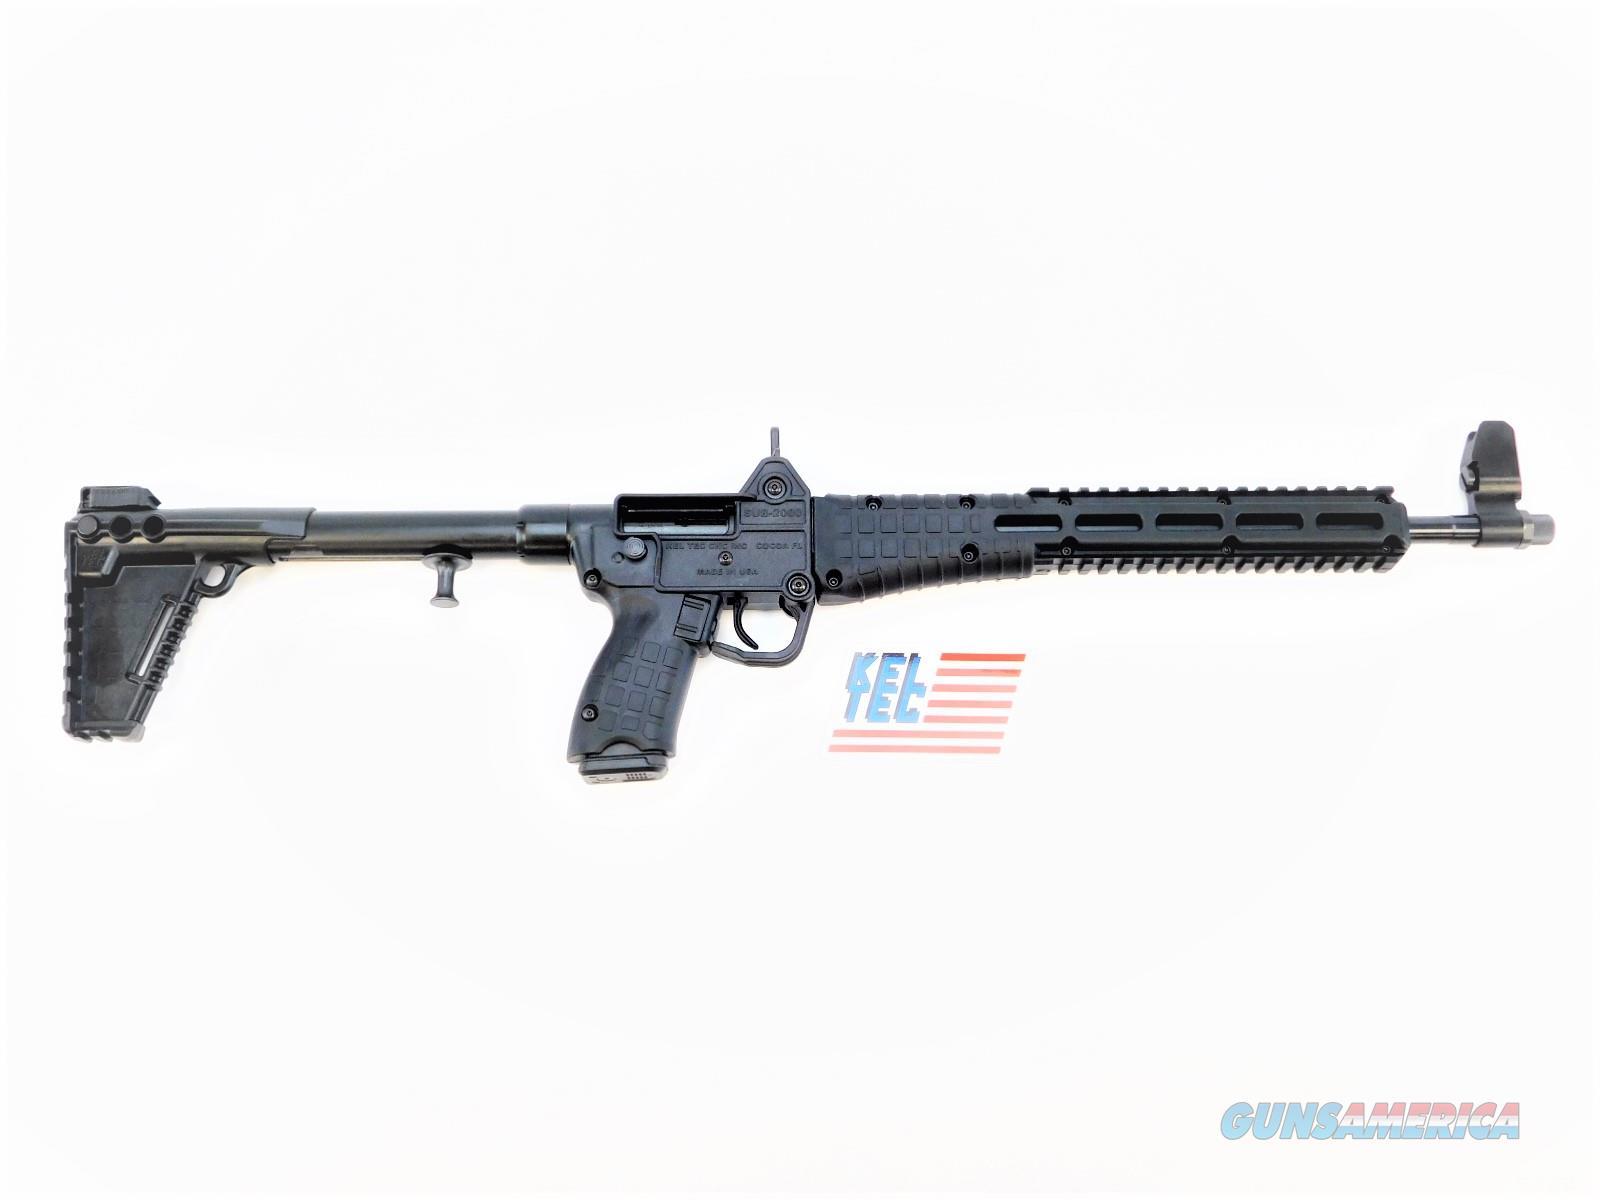 Kel-Tec Sub 2000 9mm Glock 17 Rds SUB-2K9-GLK   Guns > Rifles > Kel-Tec Rifles